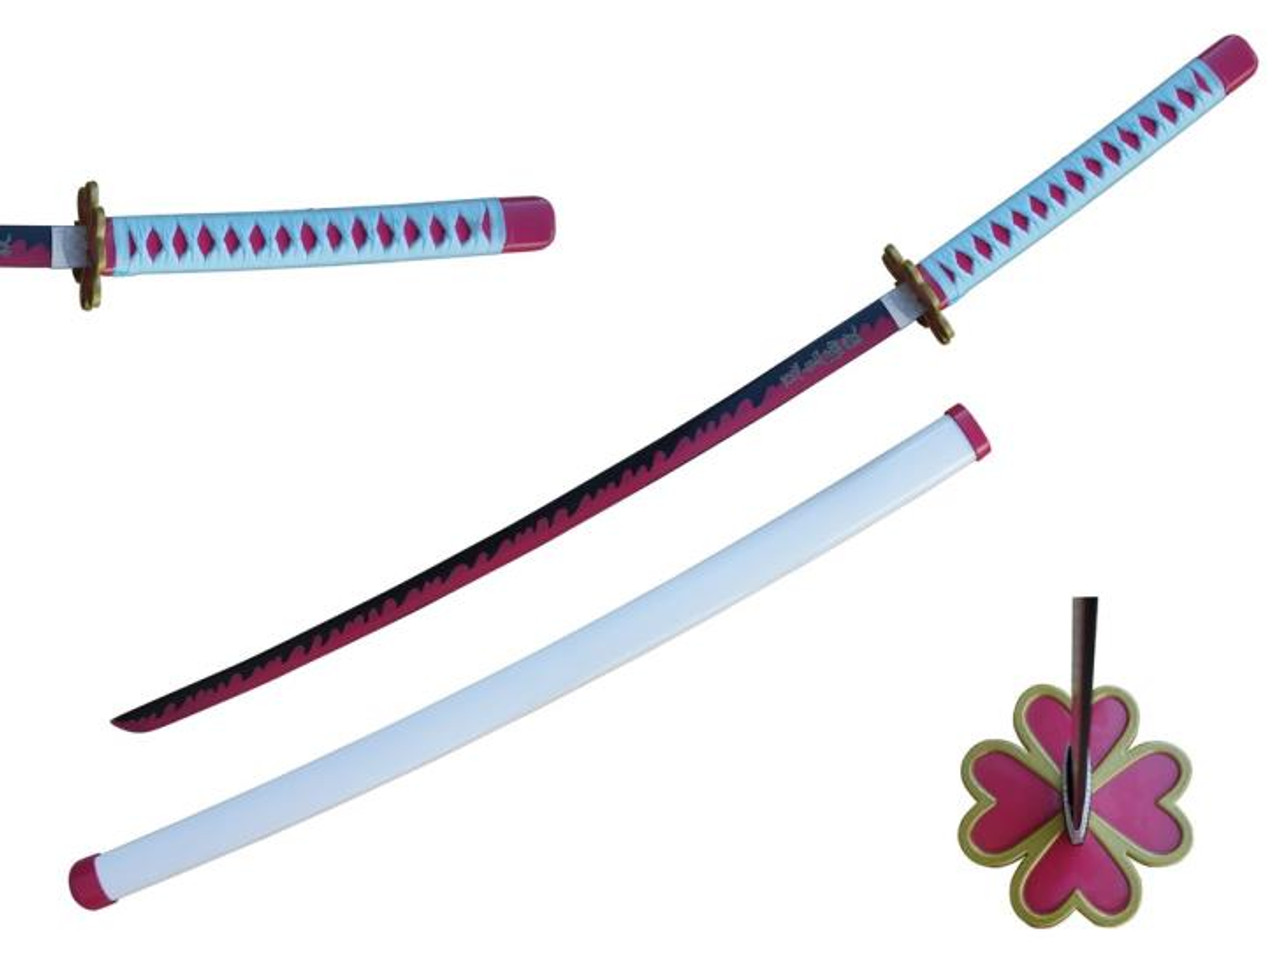 Demon Slayer Anime Mitsuri Kanroji Katana Sword Pure Blades Camelot stay in top 10 (dec 14, 2020). demon slayer anime mitsuri kanroji katana sword